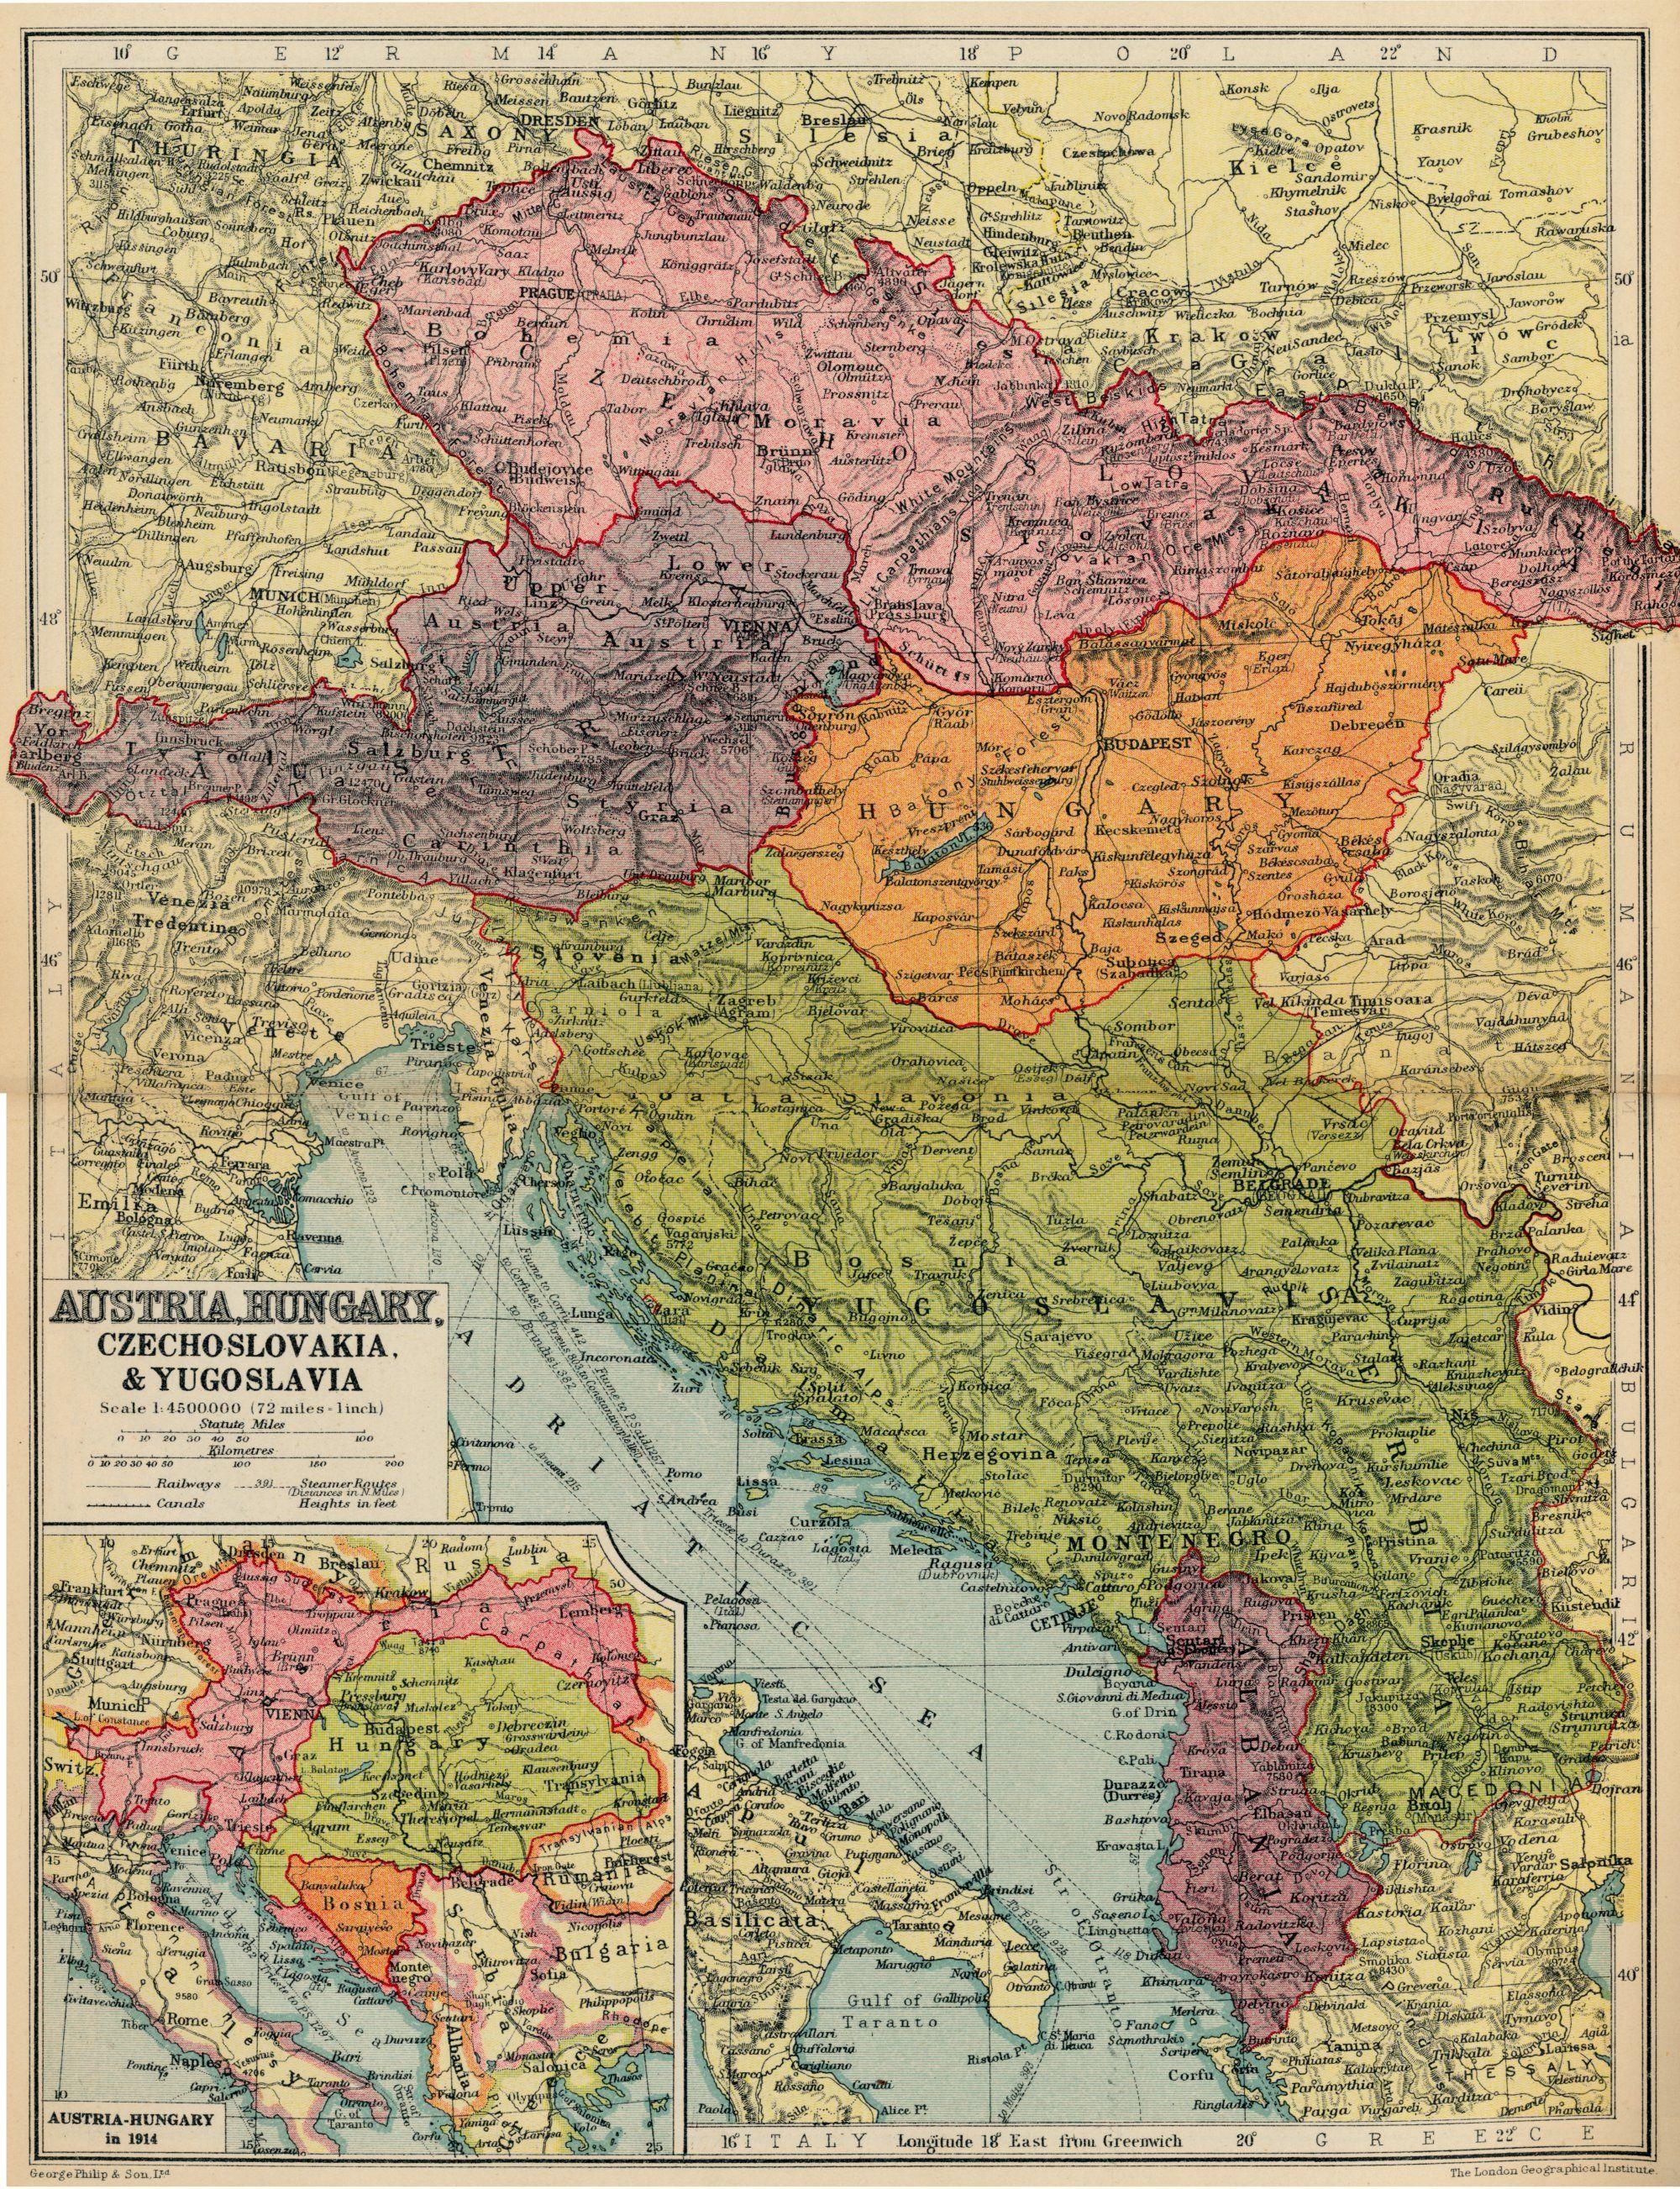 Czechoslovakia 1936. It was not Czechoslovakia until after 1945. One ...